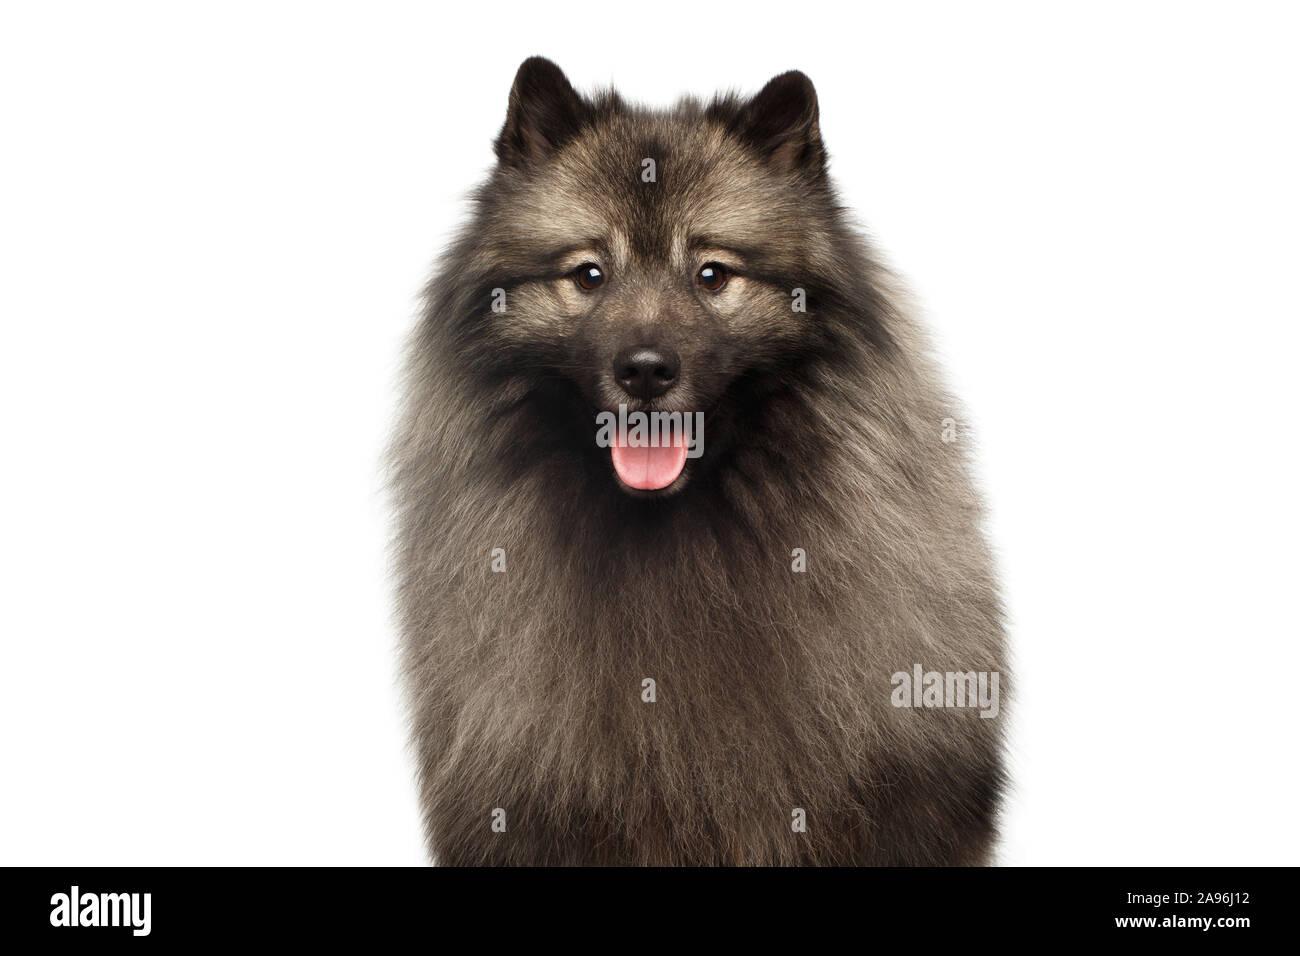 Retrato de Keeshond peludo perro mirando en cámara aislada sobre fondo blanco. Foto de stock